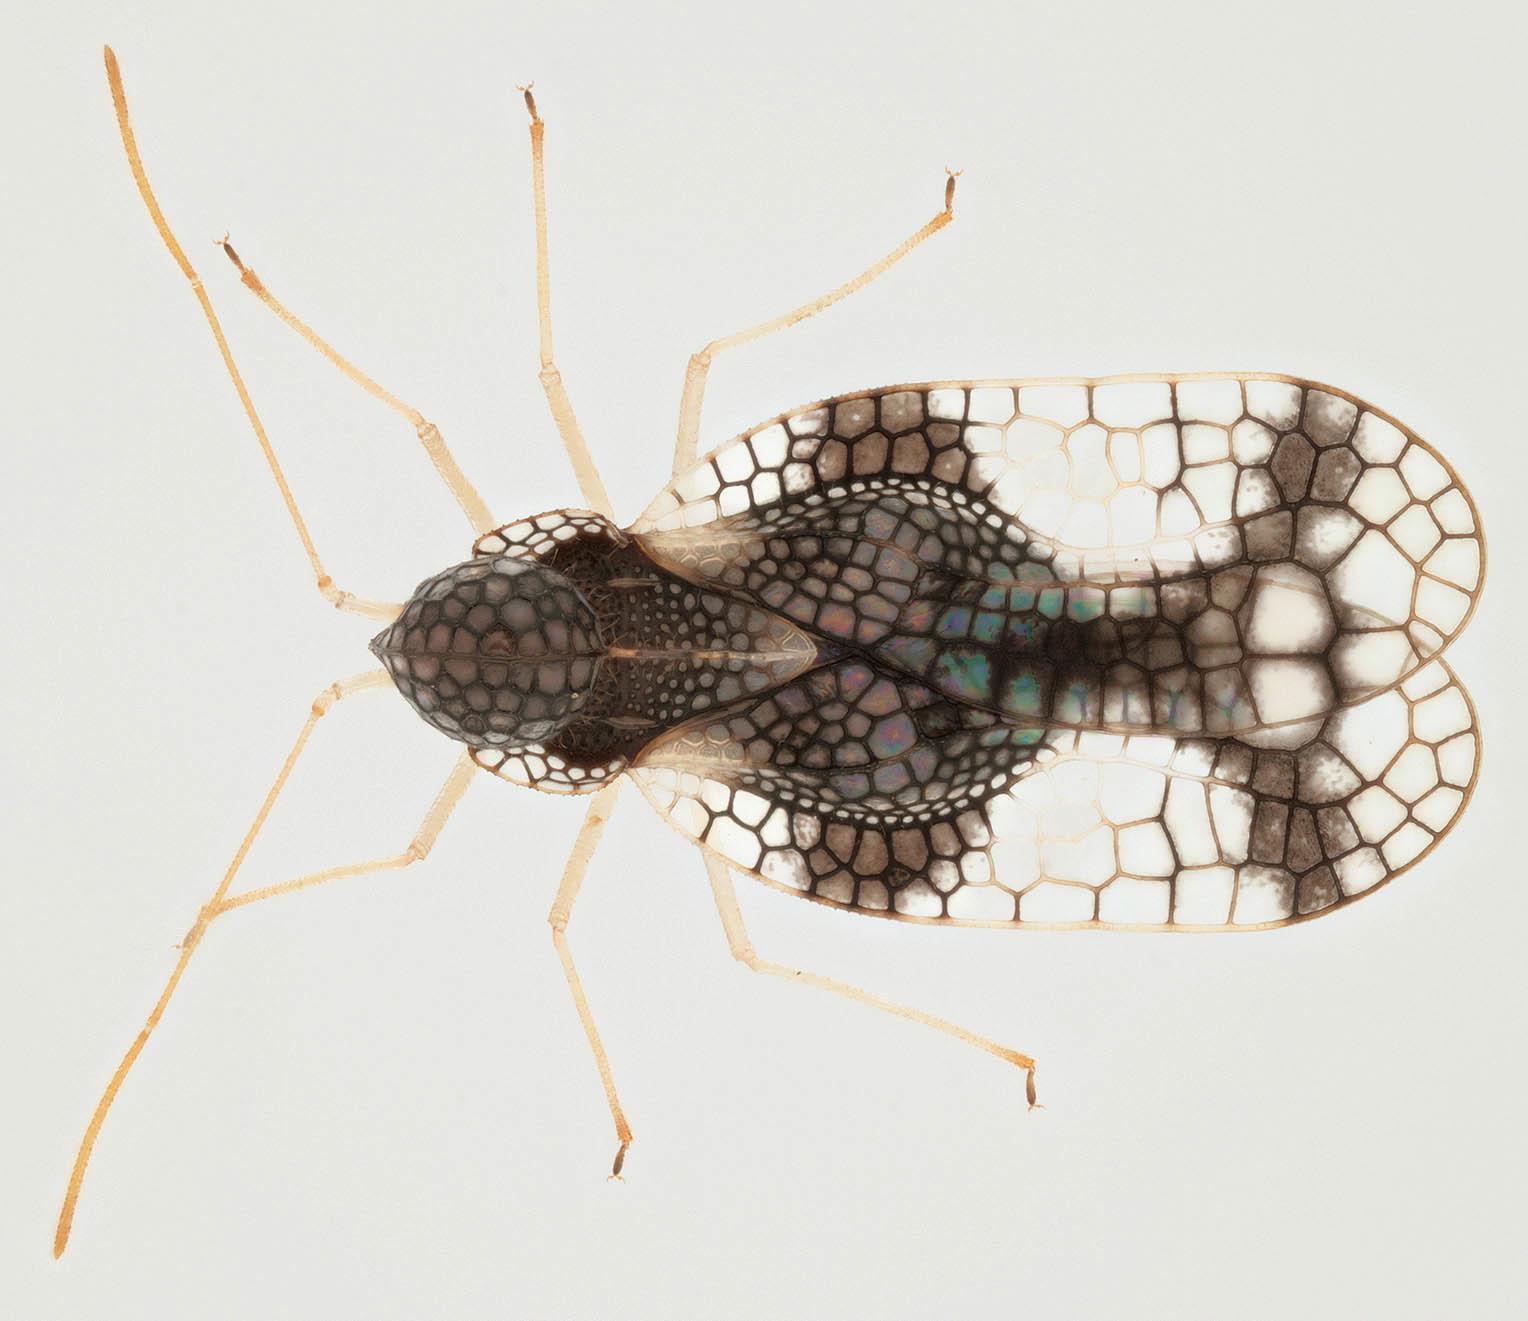 Image of Andromeda lace bug